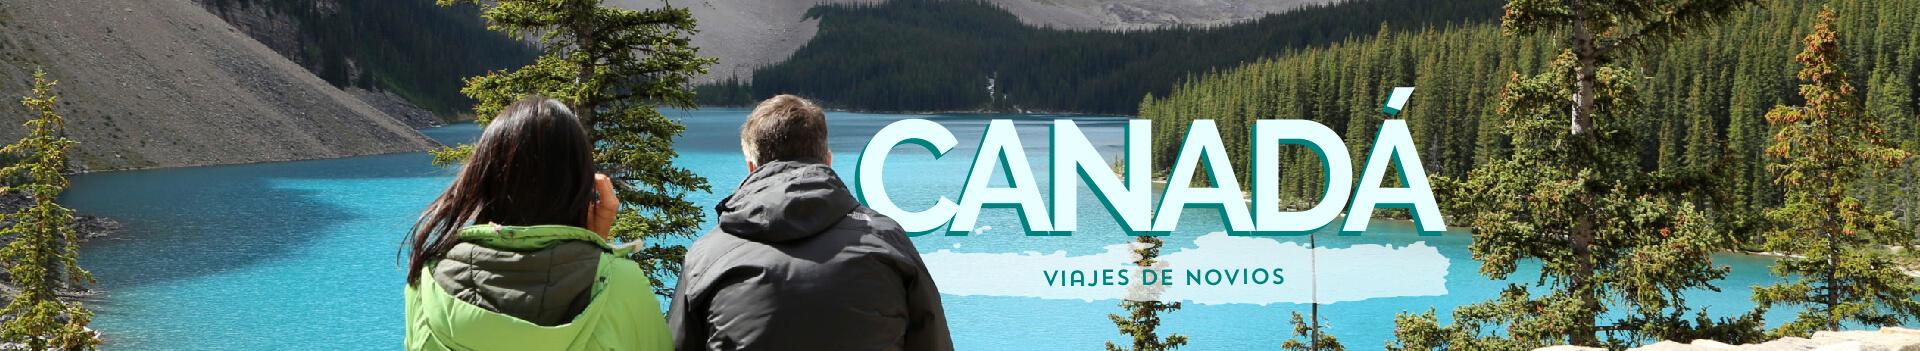 Viajes de Novios a Canadá